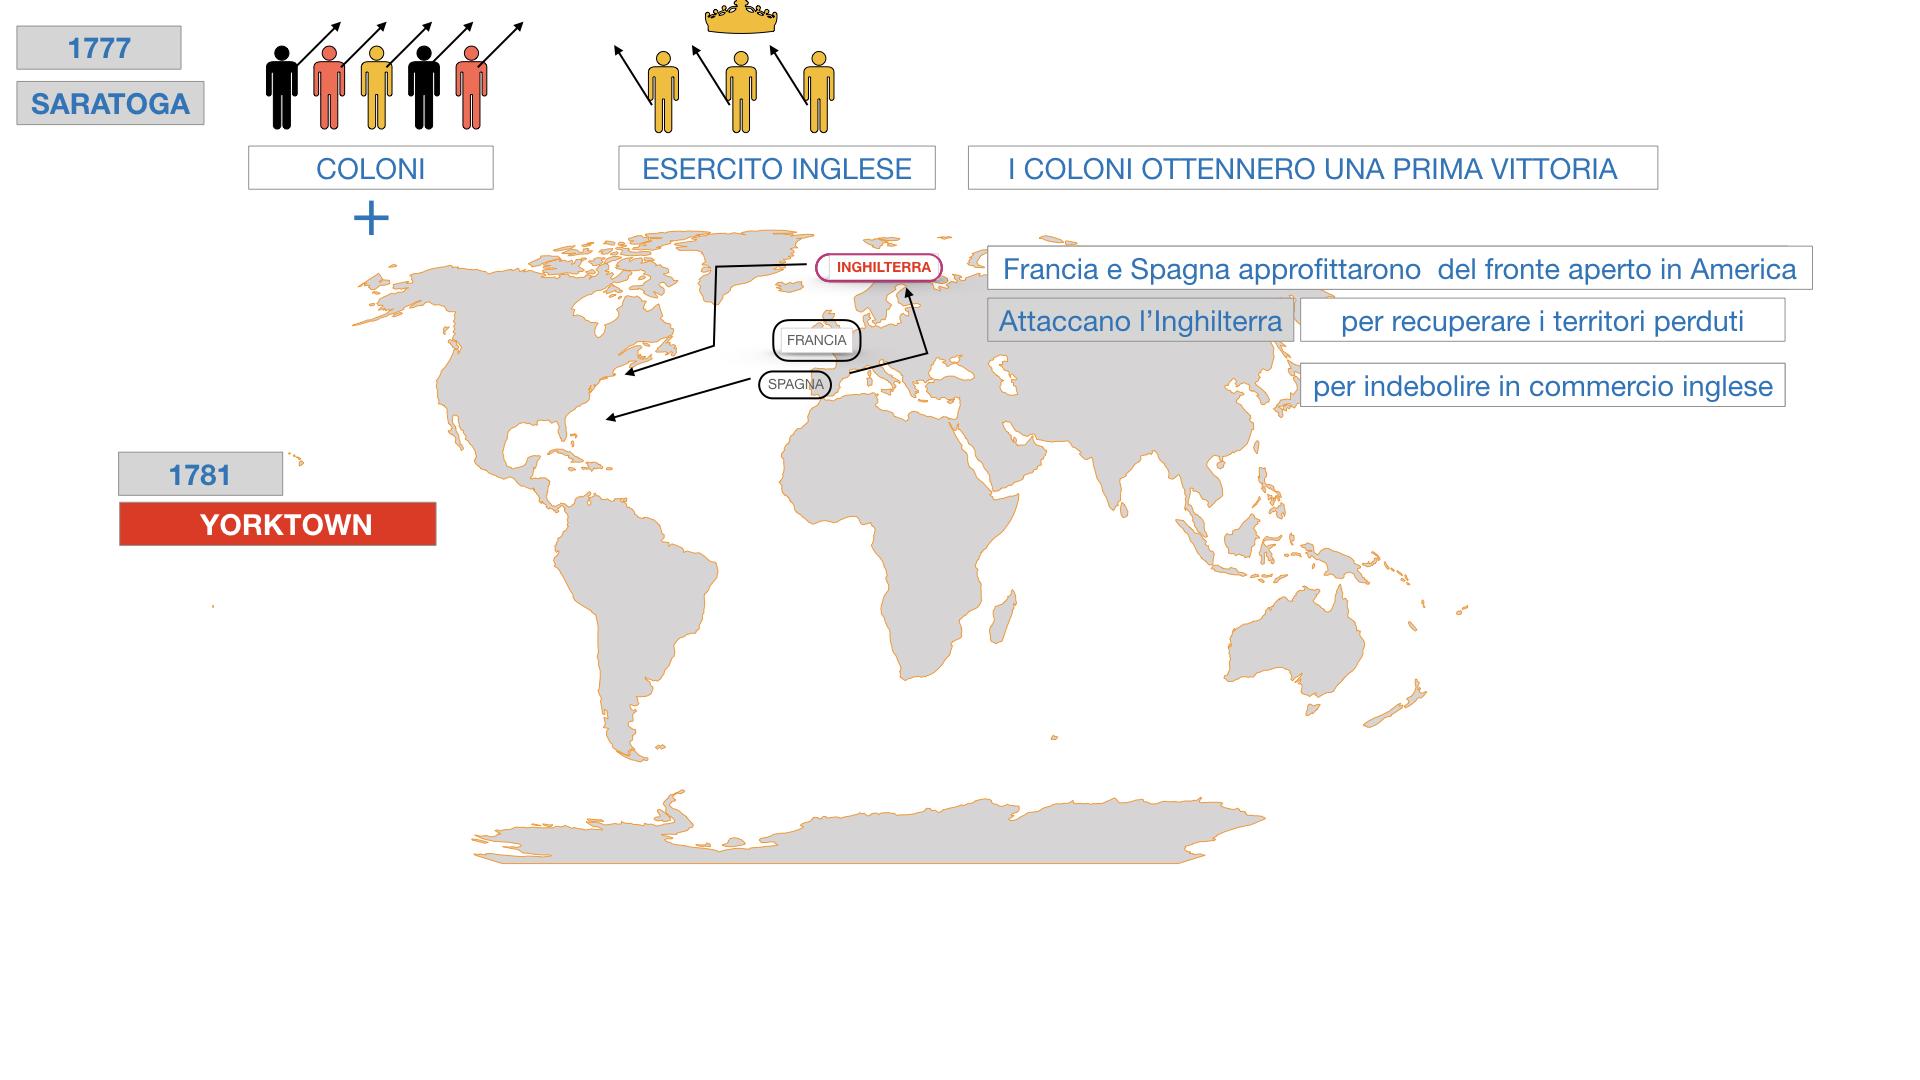 GUERRA DI INDIPENDENZA AMERICANA_SIMULAZIONE.129